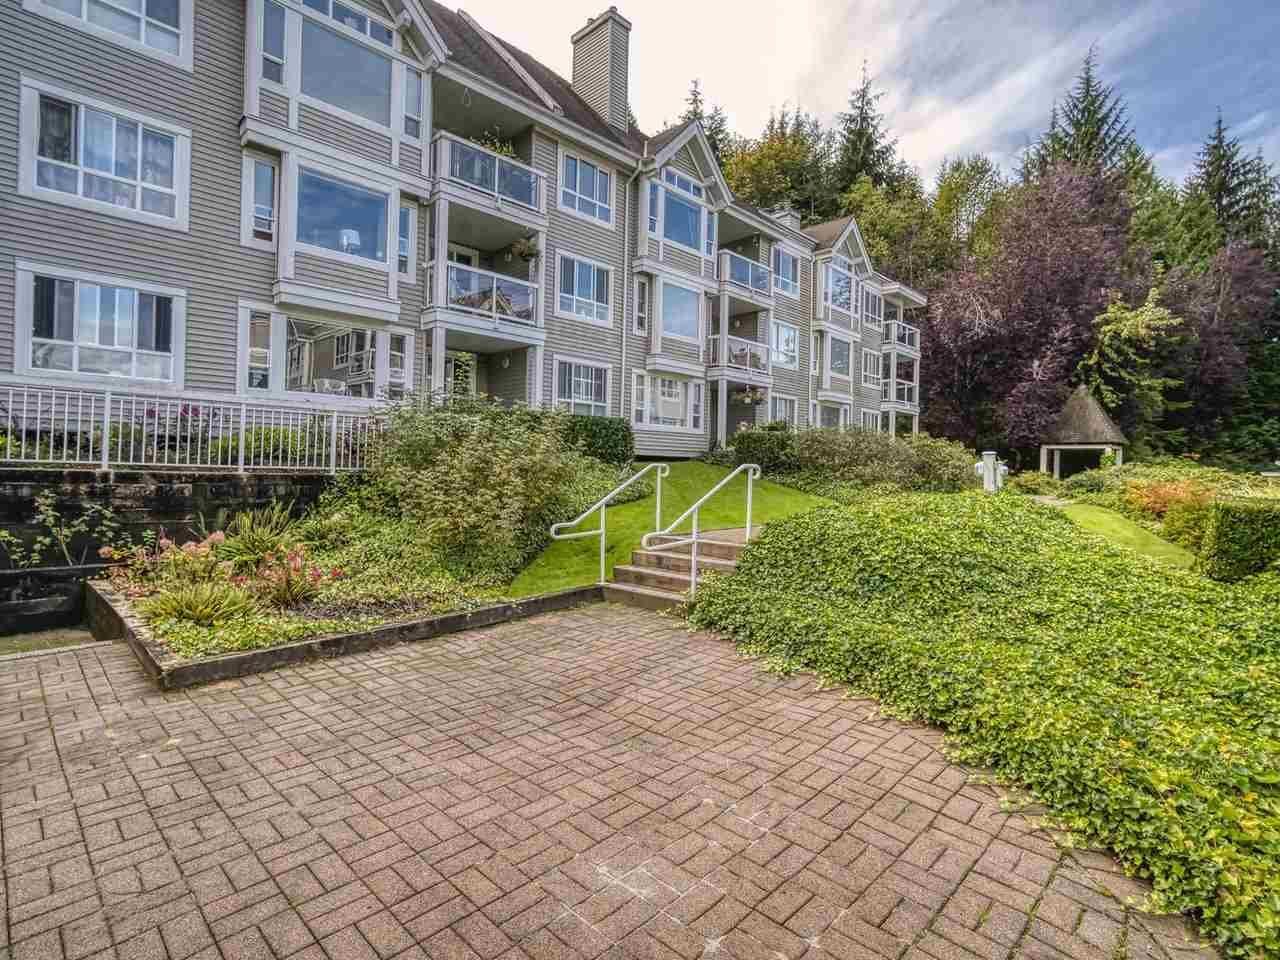 "Main Photo: 102 3099 TERRAVISTA Place in Port Moody: Port Moody Centre Condo for sale in ""THE GLENMORE"" : MLS®# R2500937"